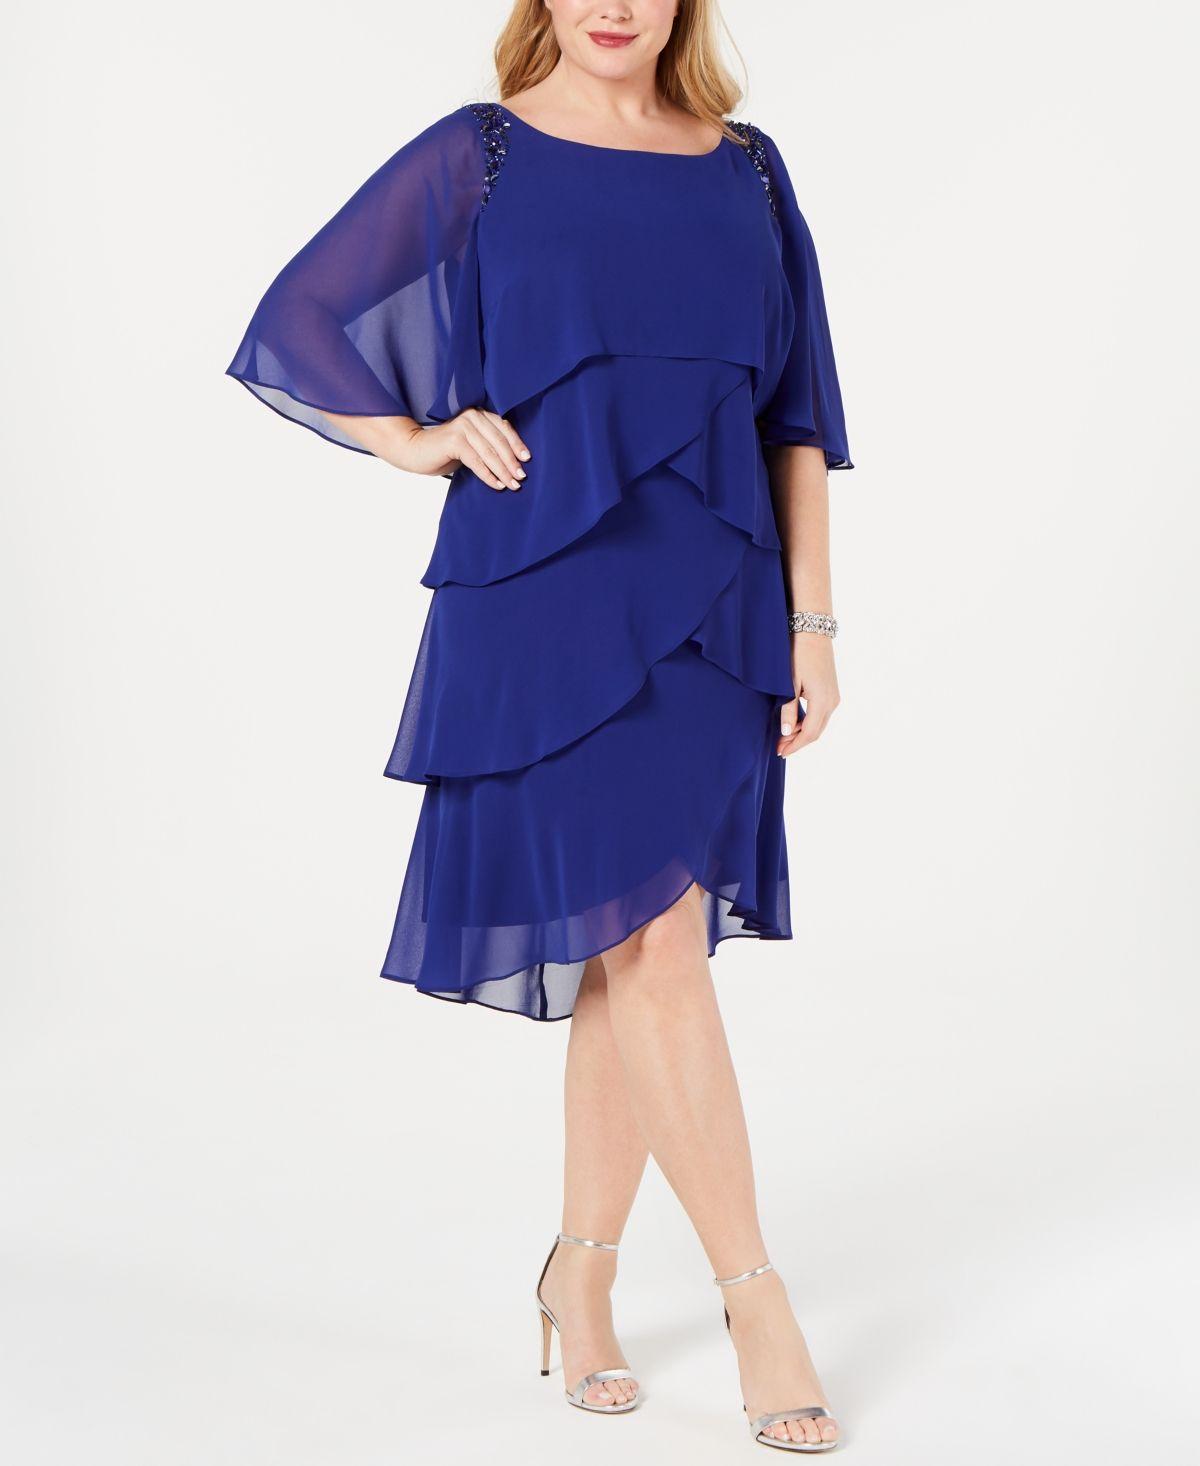 Fashions Womens Plus Size Cape Dress S.L